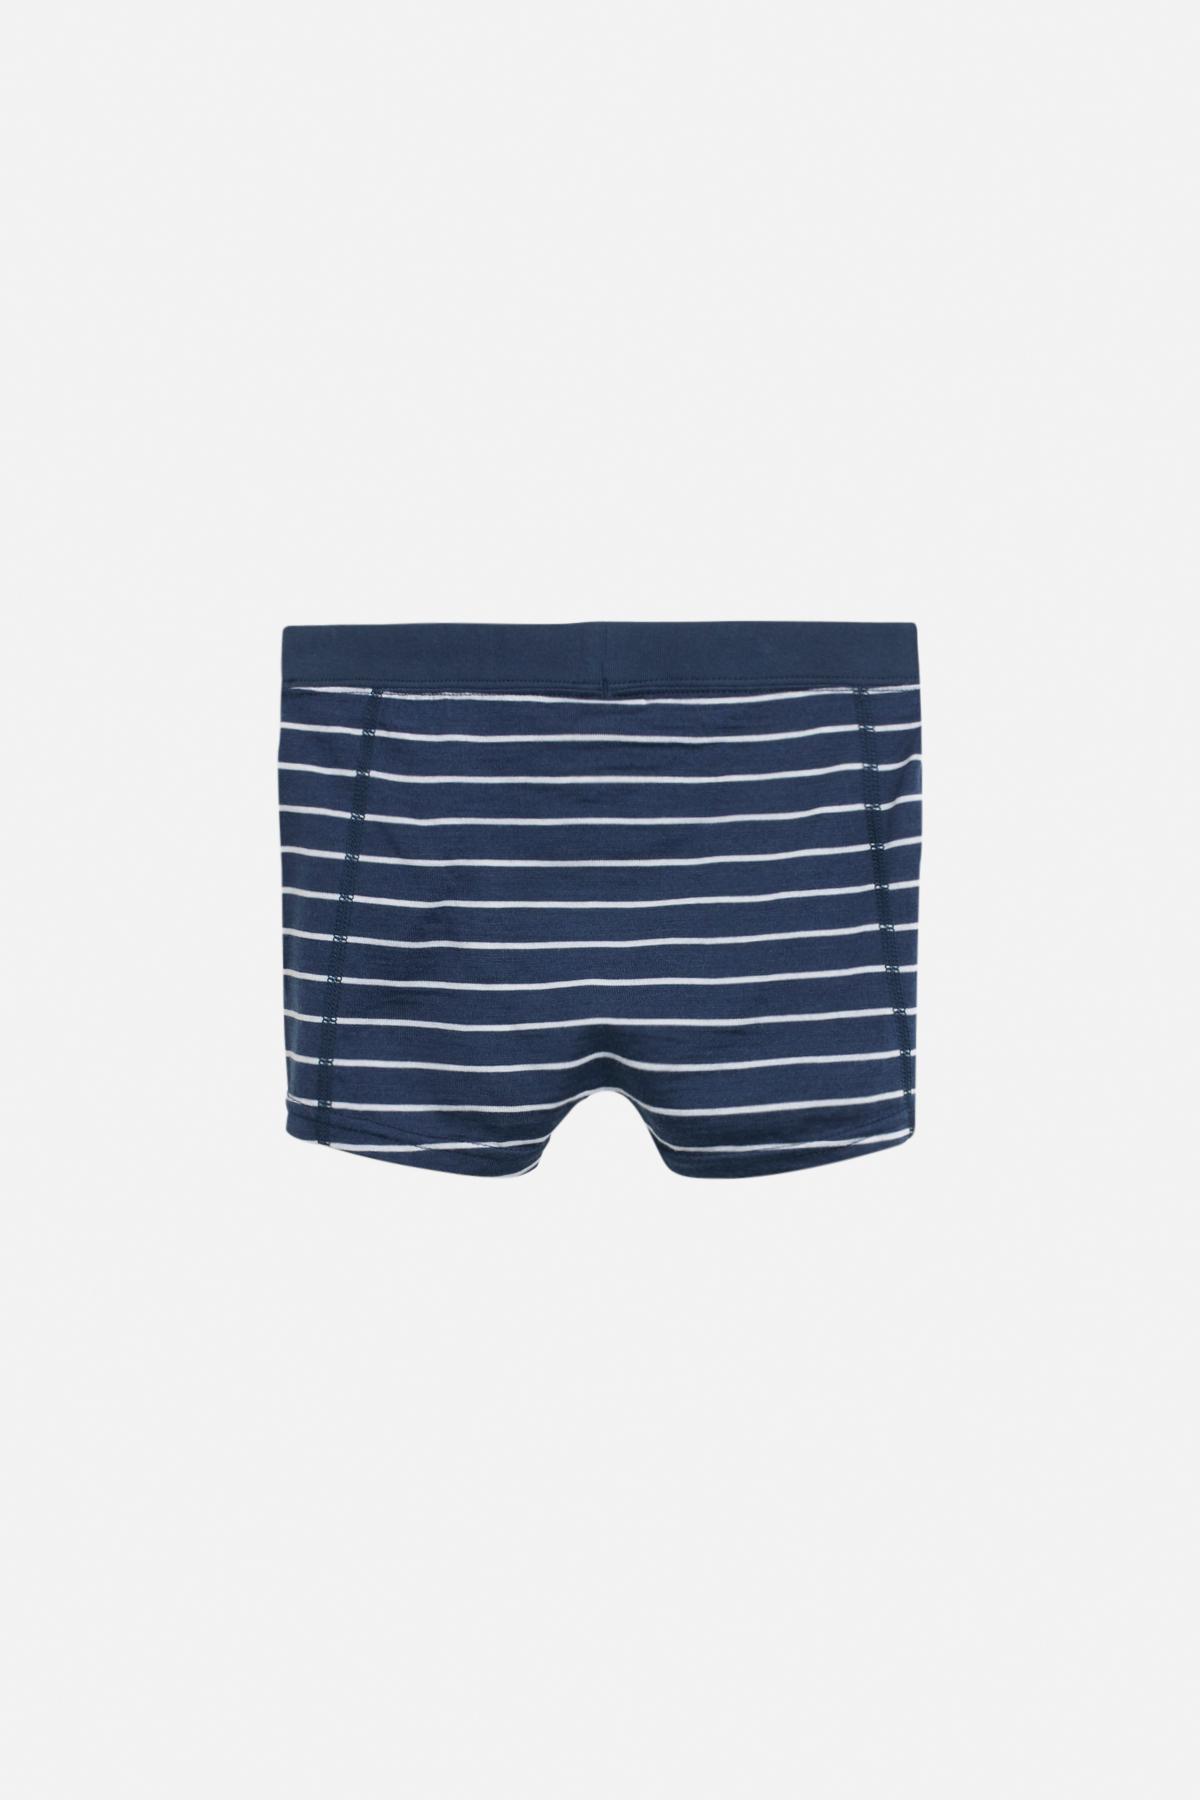 Wool/Silk - Fiodor - Underpants